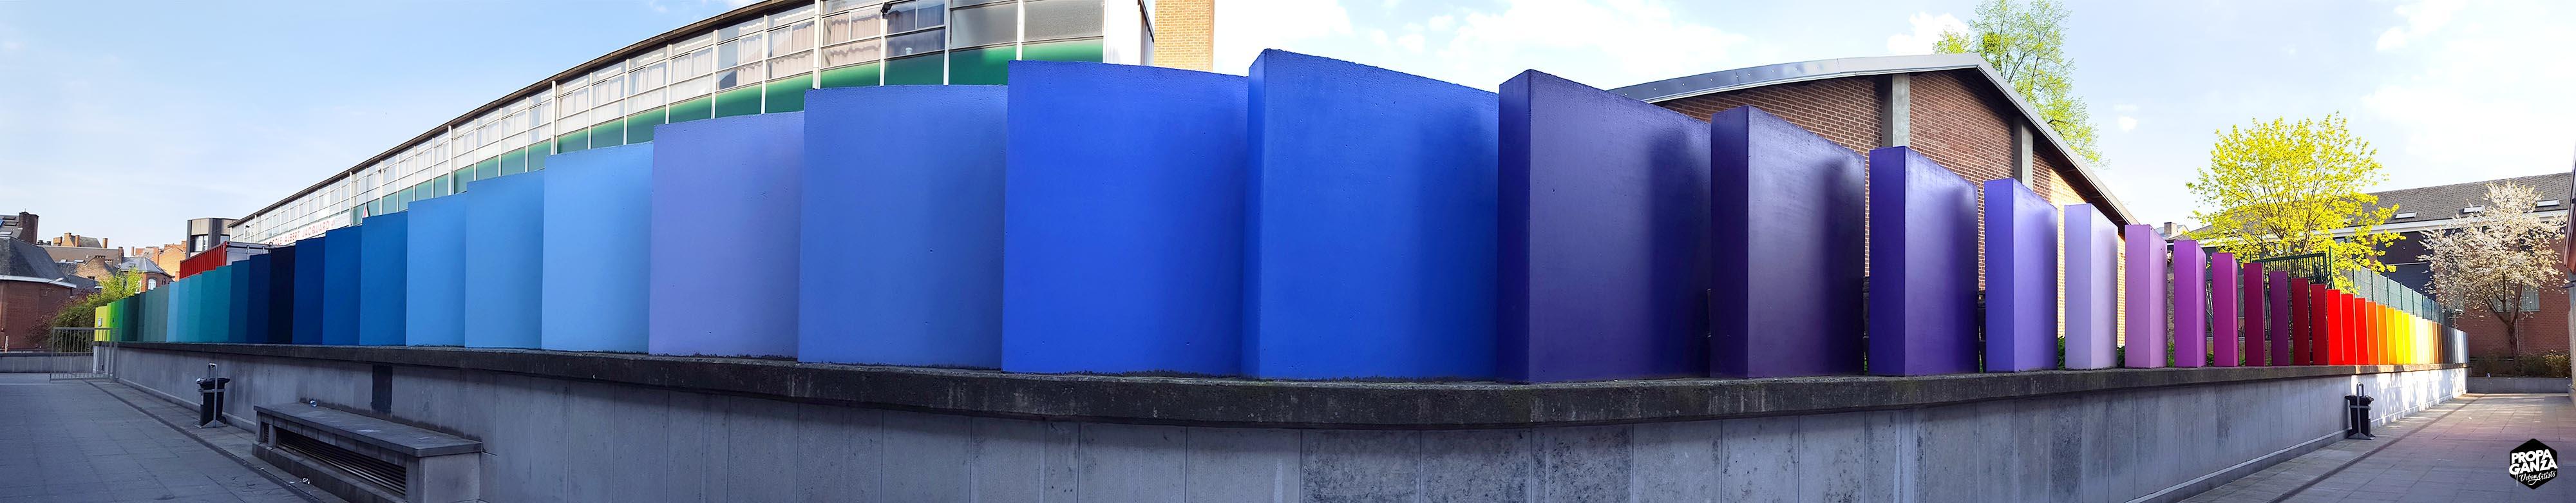 https://www.propaganza.be/wp-content/uploads/2019/04/propaganza-nuancier-namur-couleur-gradient-belgique-street-art-belgium-city-color-1.jpg